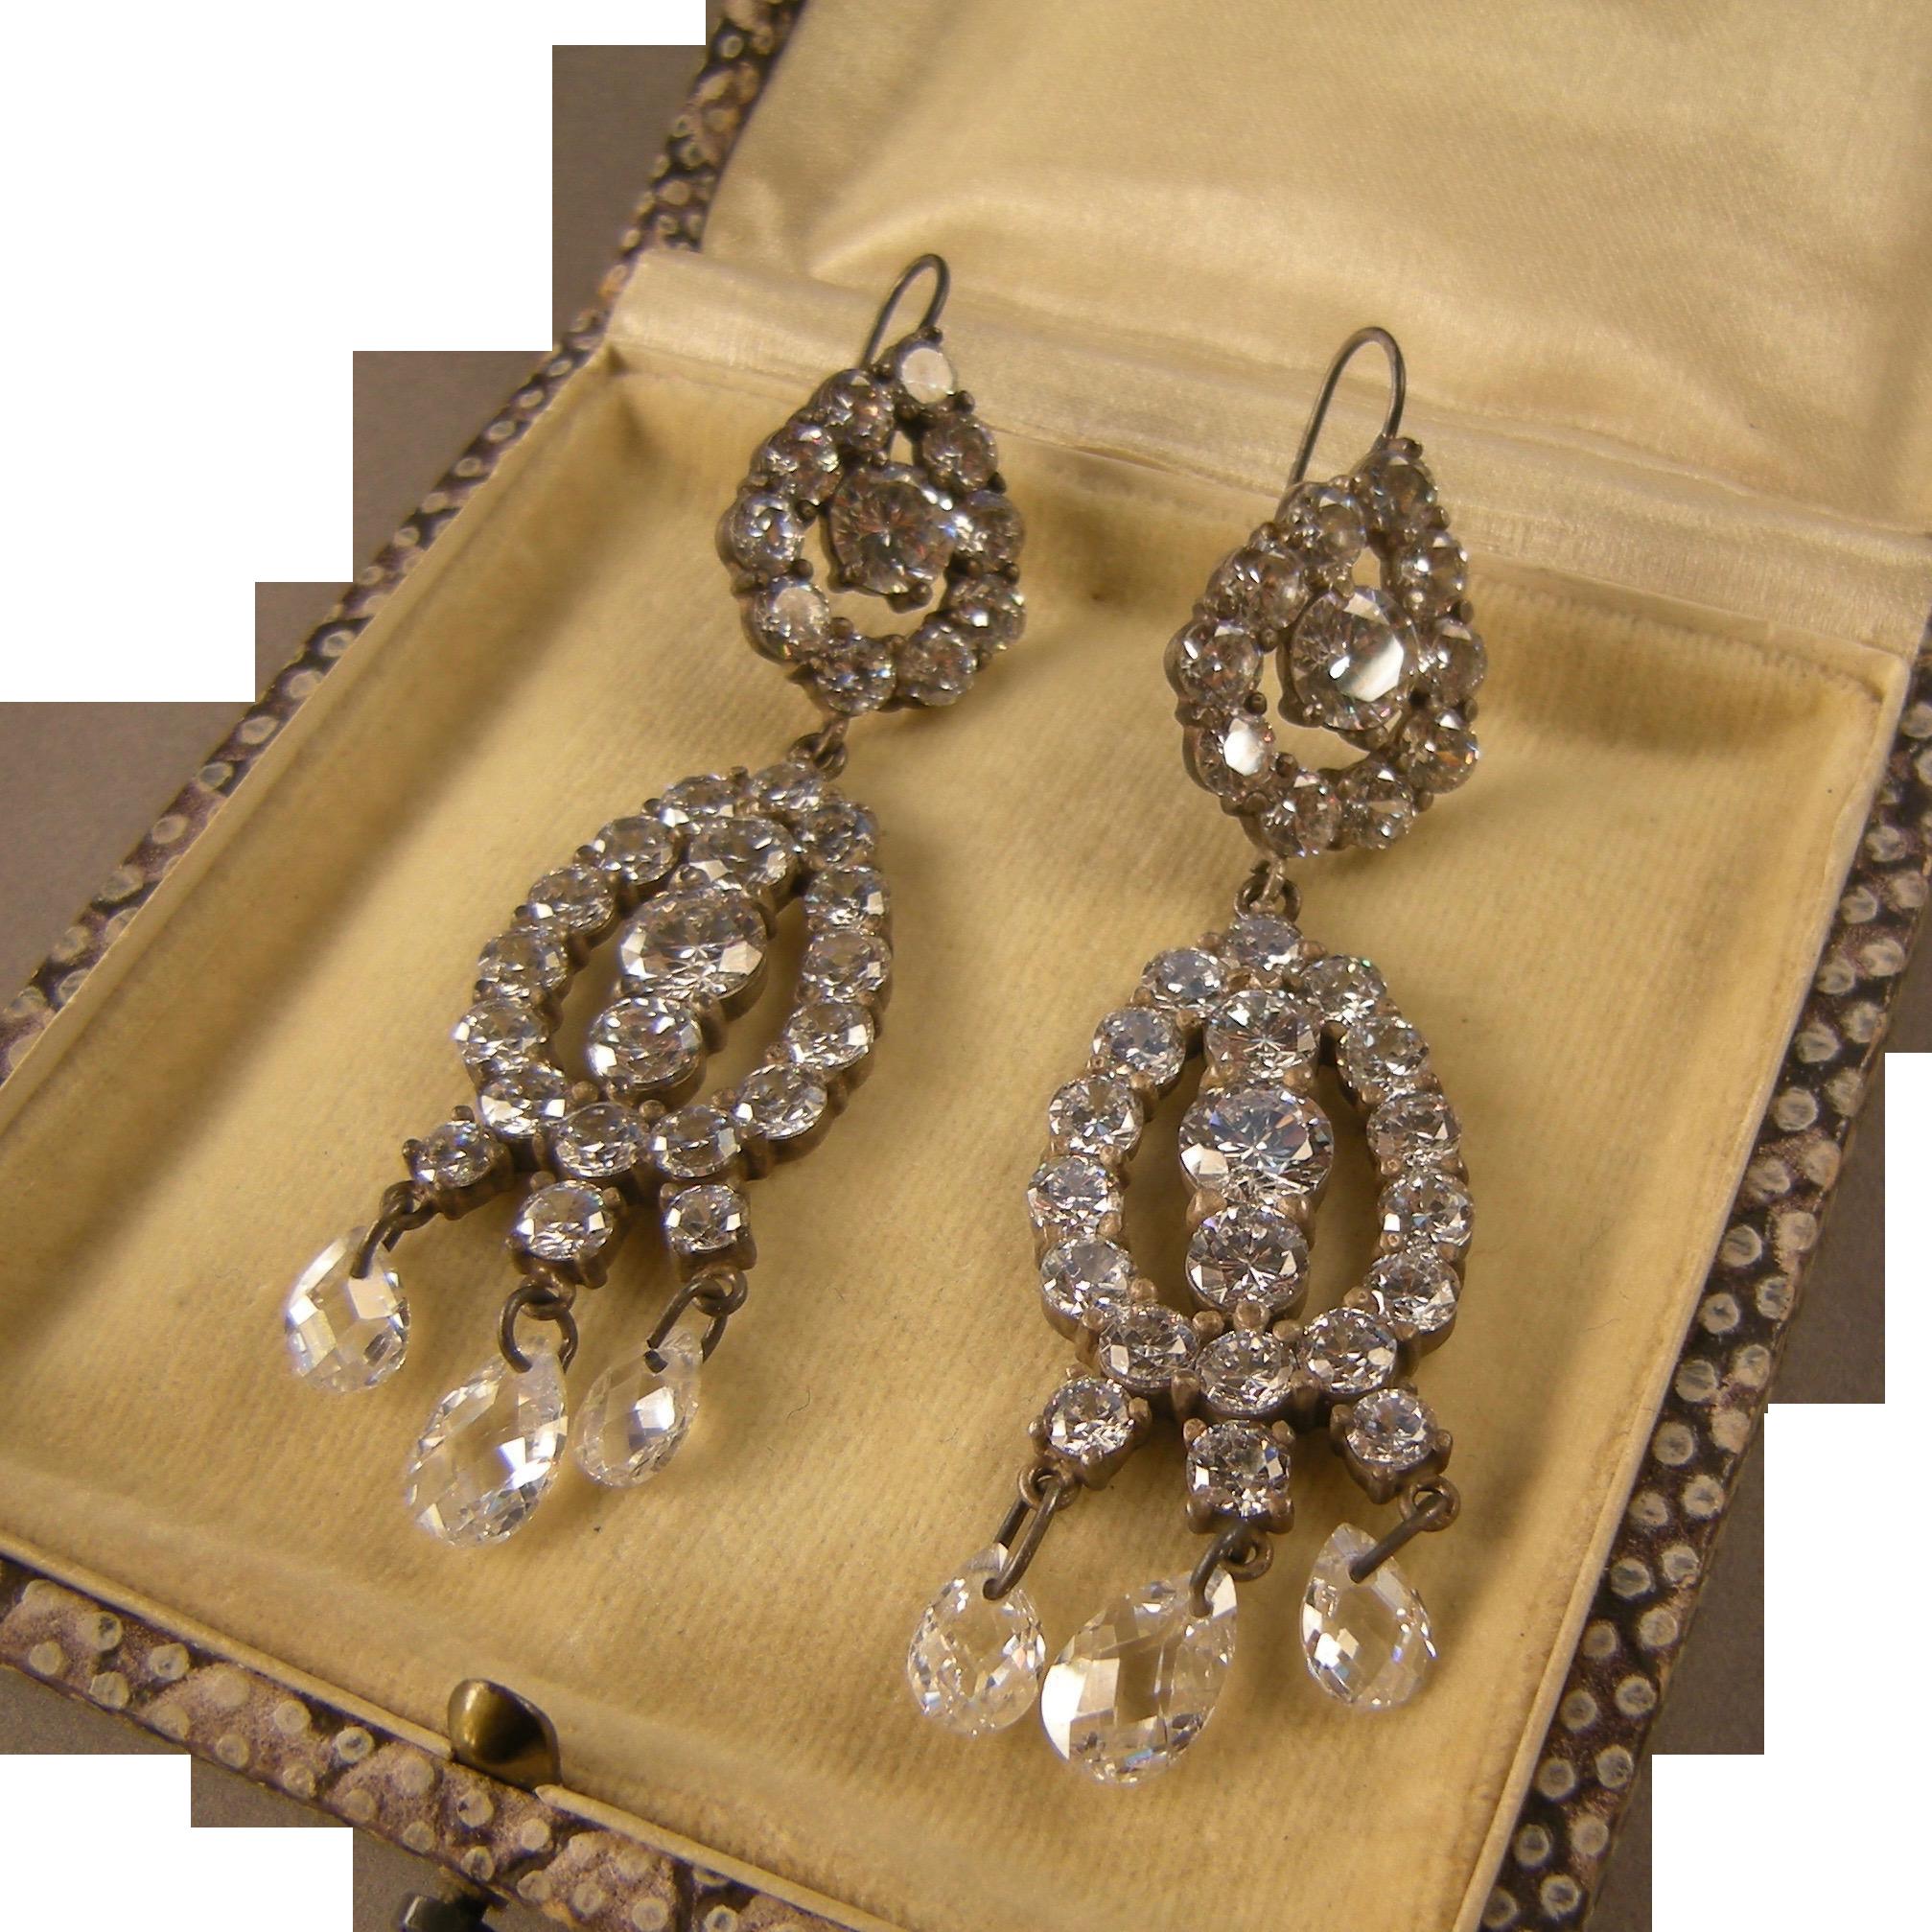 Radiant Crystals Chandelier Earrings, Sterling, Spectacular Vintage